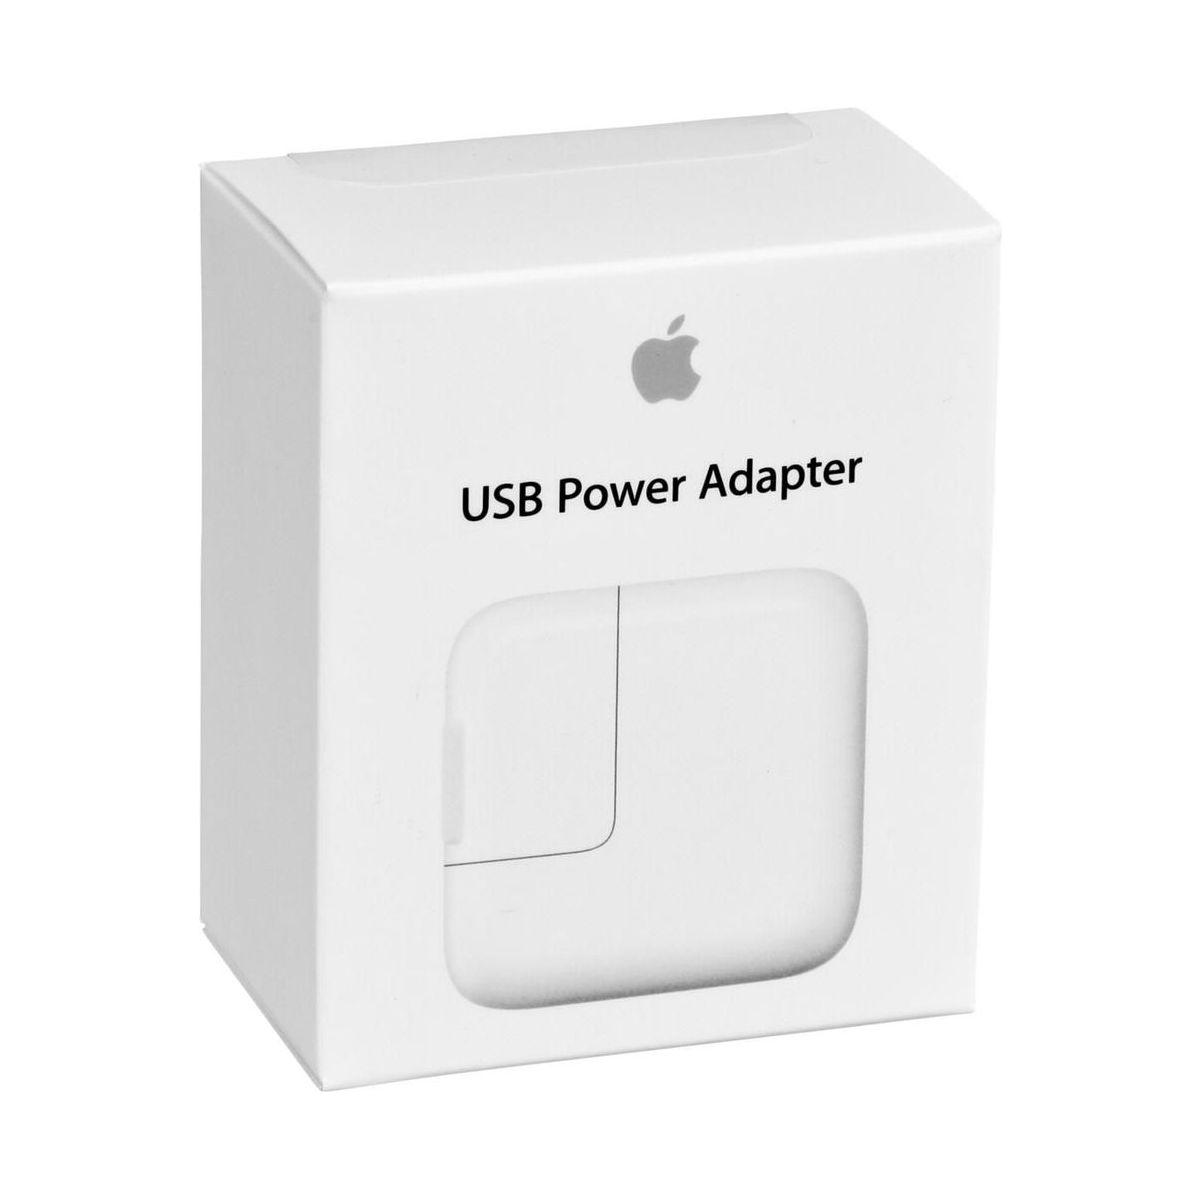 Adaptateur apple usb 12w ipad (photo)